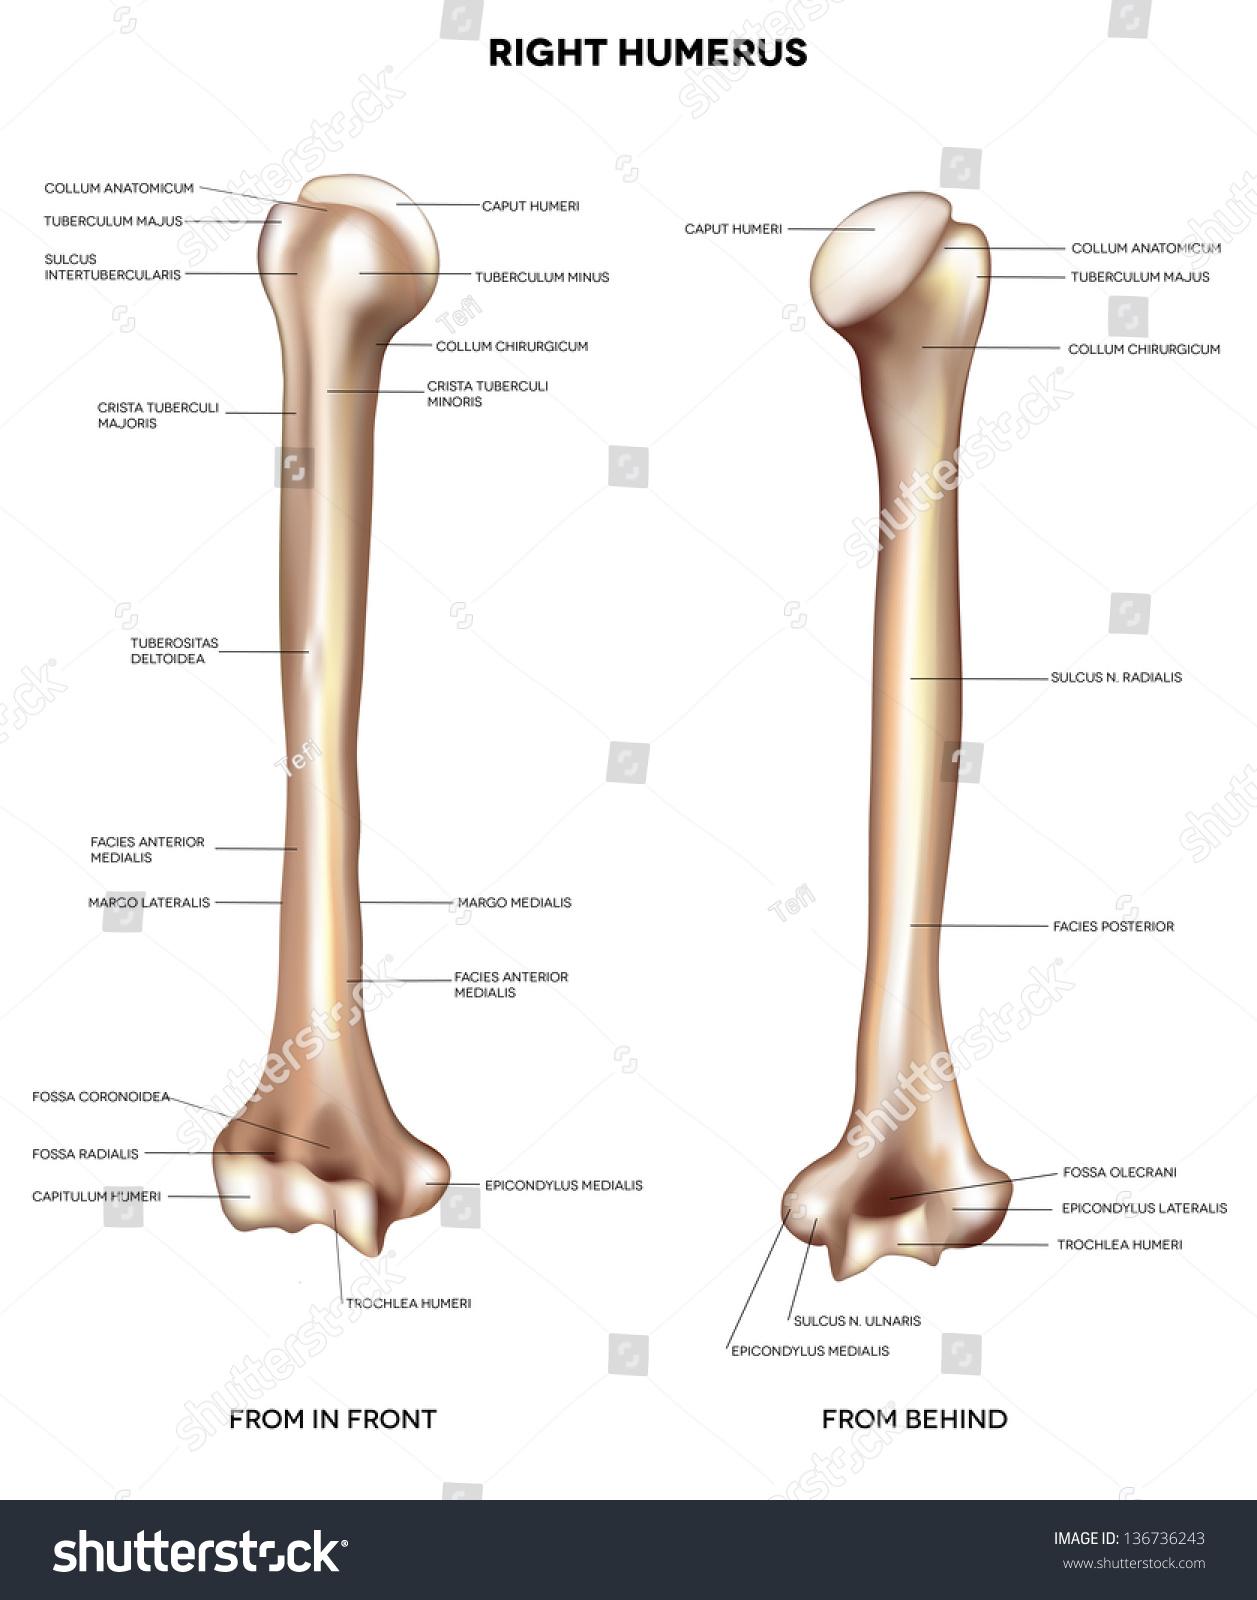 humerus upper arm bone detailed medical stock vector (royalty free